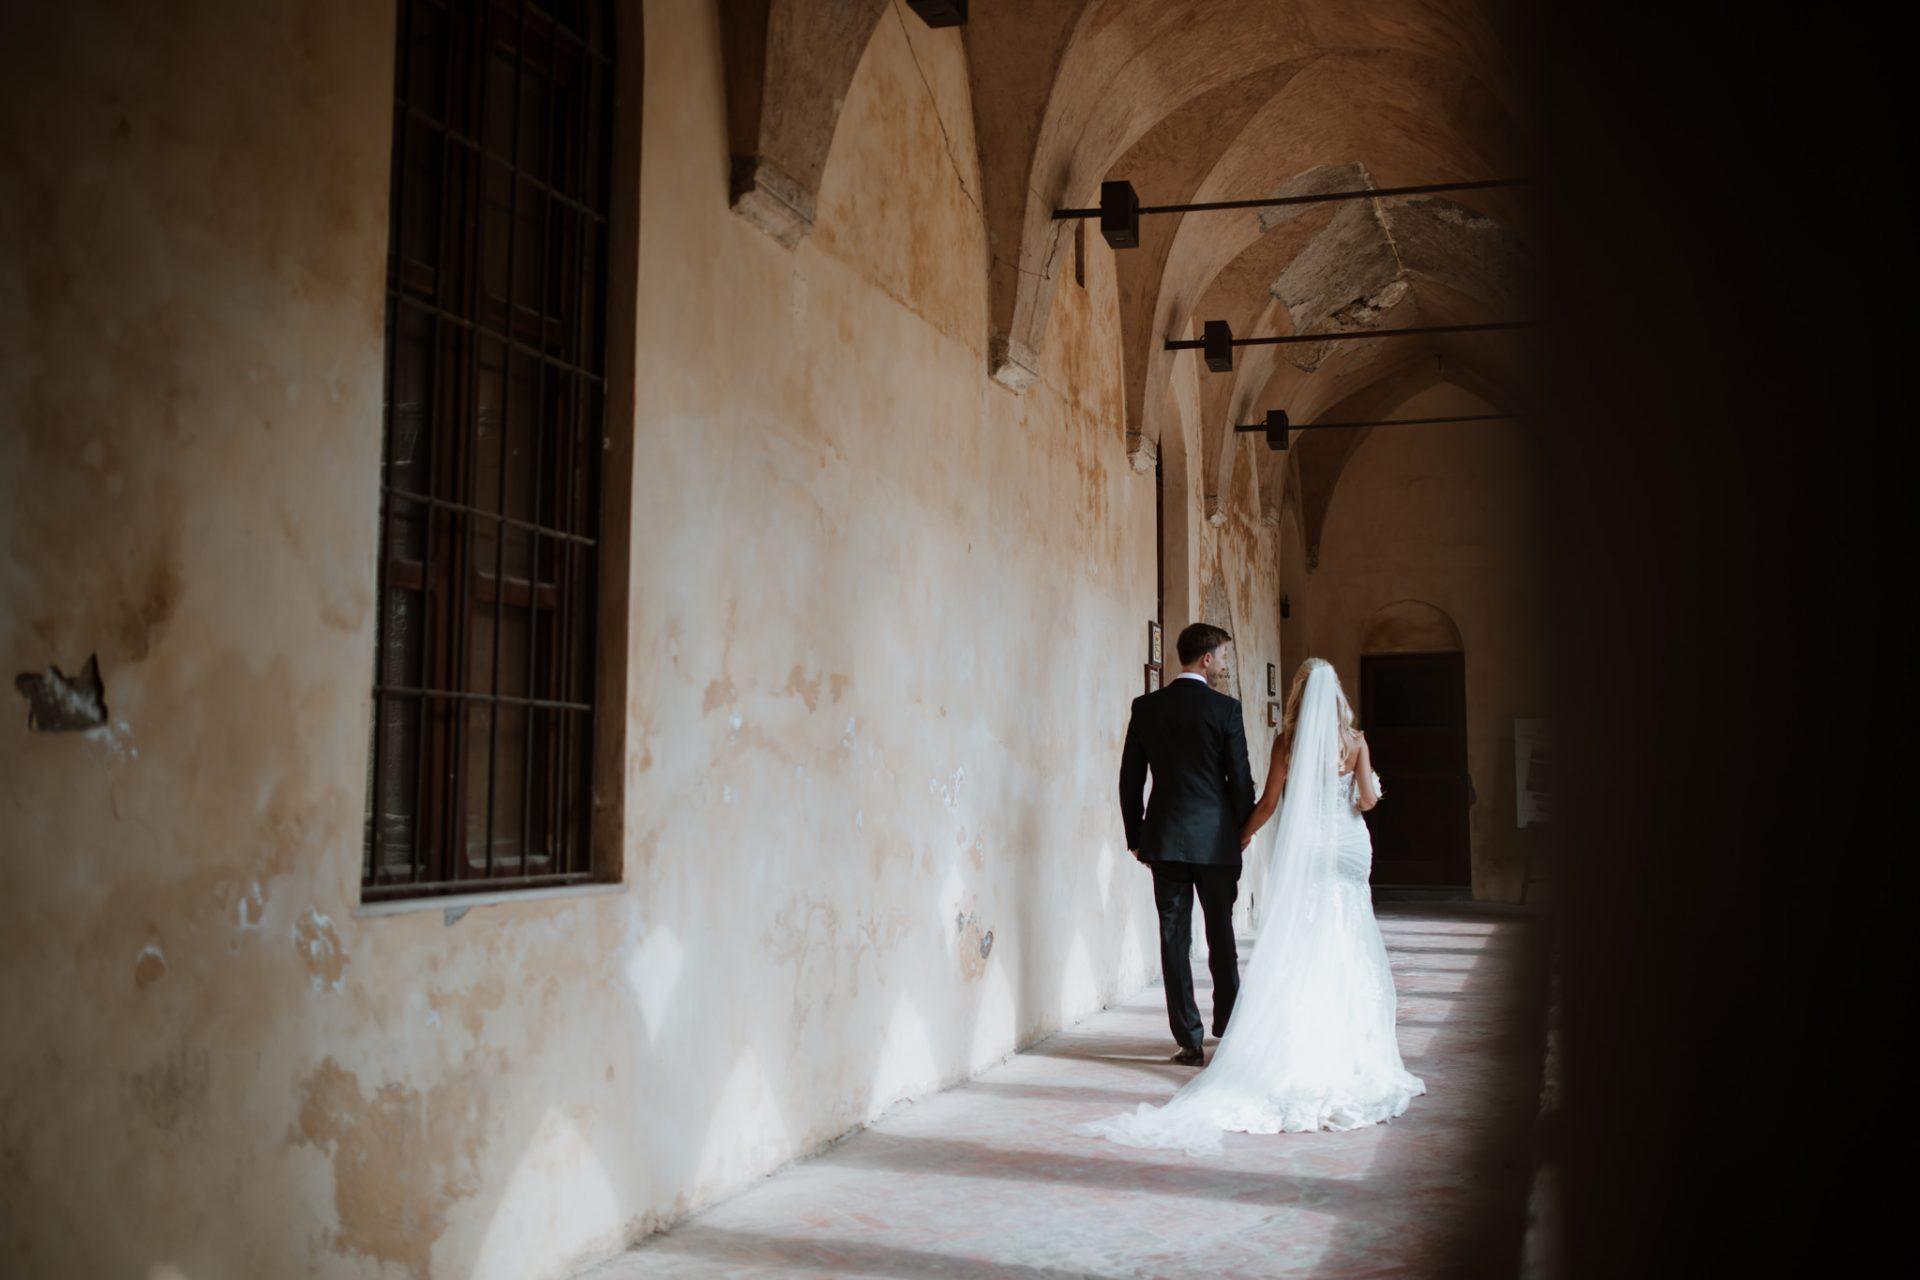 bride and groom wedding photography sorrento cloisters chiostro di san francesco